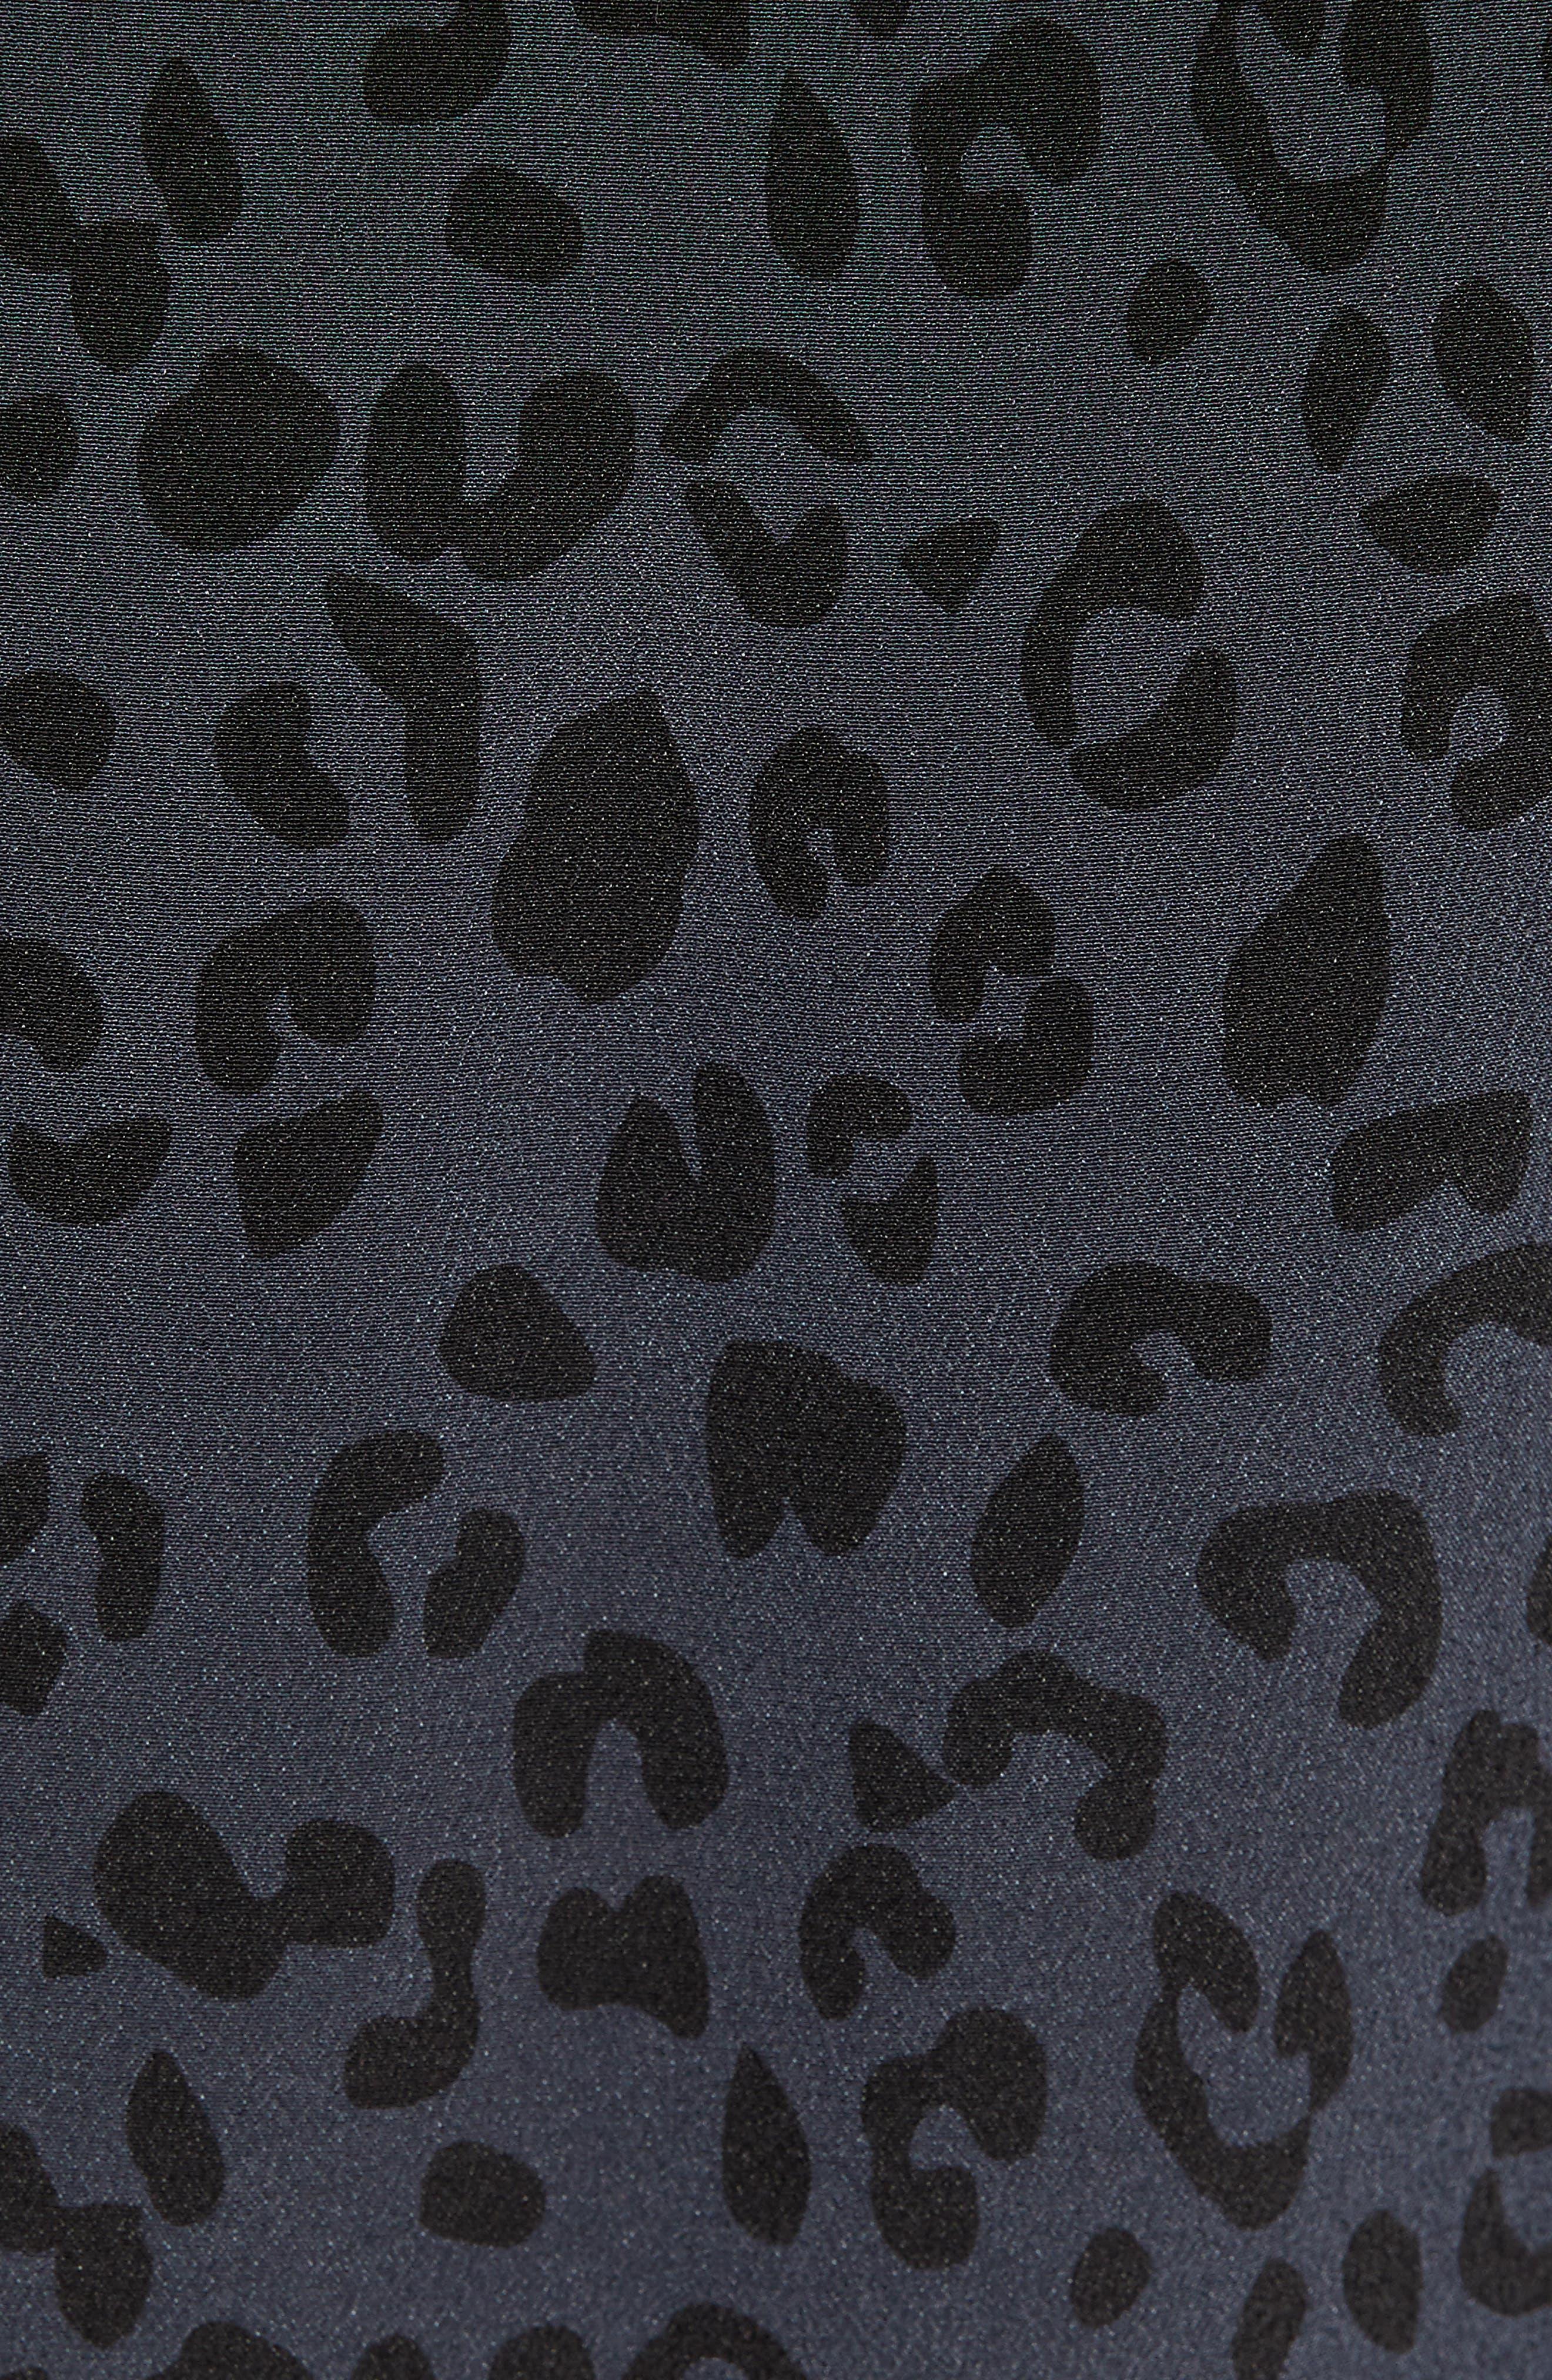 Hana Cheetah Print Dress,                             Alternate thumbnail 6, color,                             ONYX CHEETAH